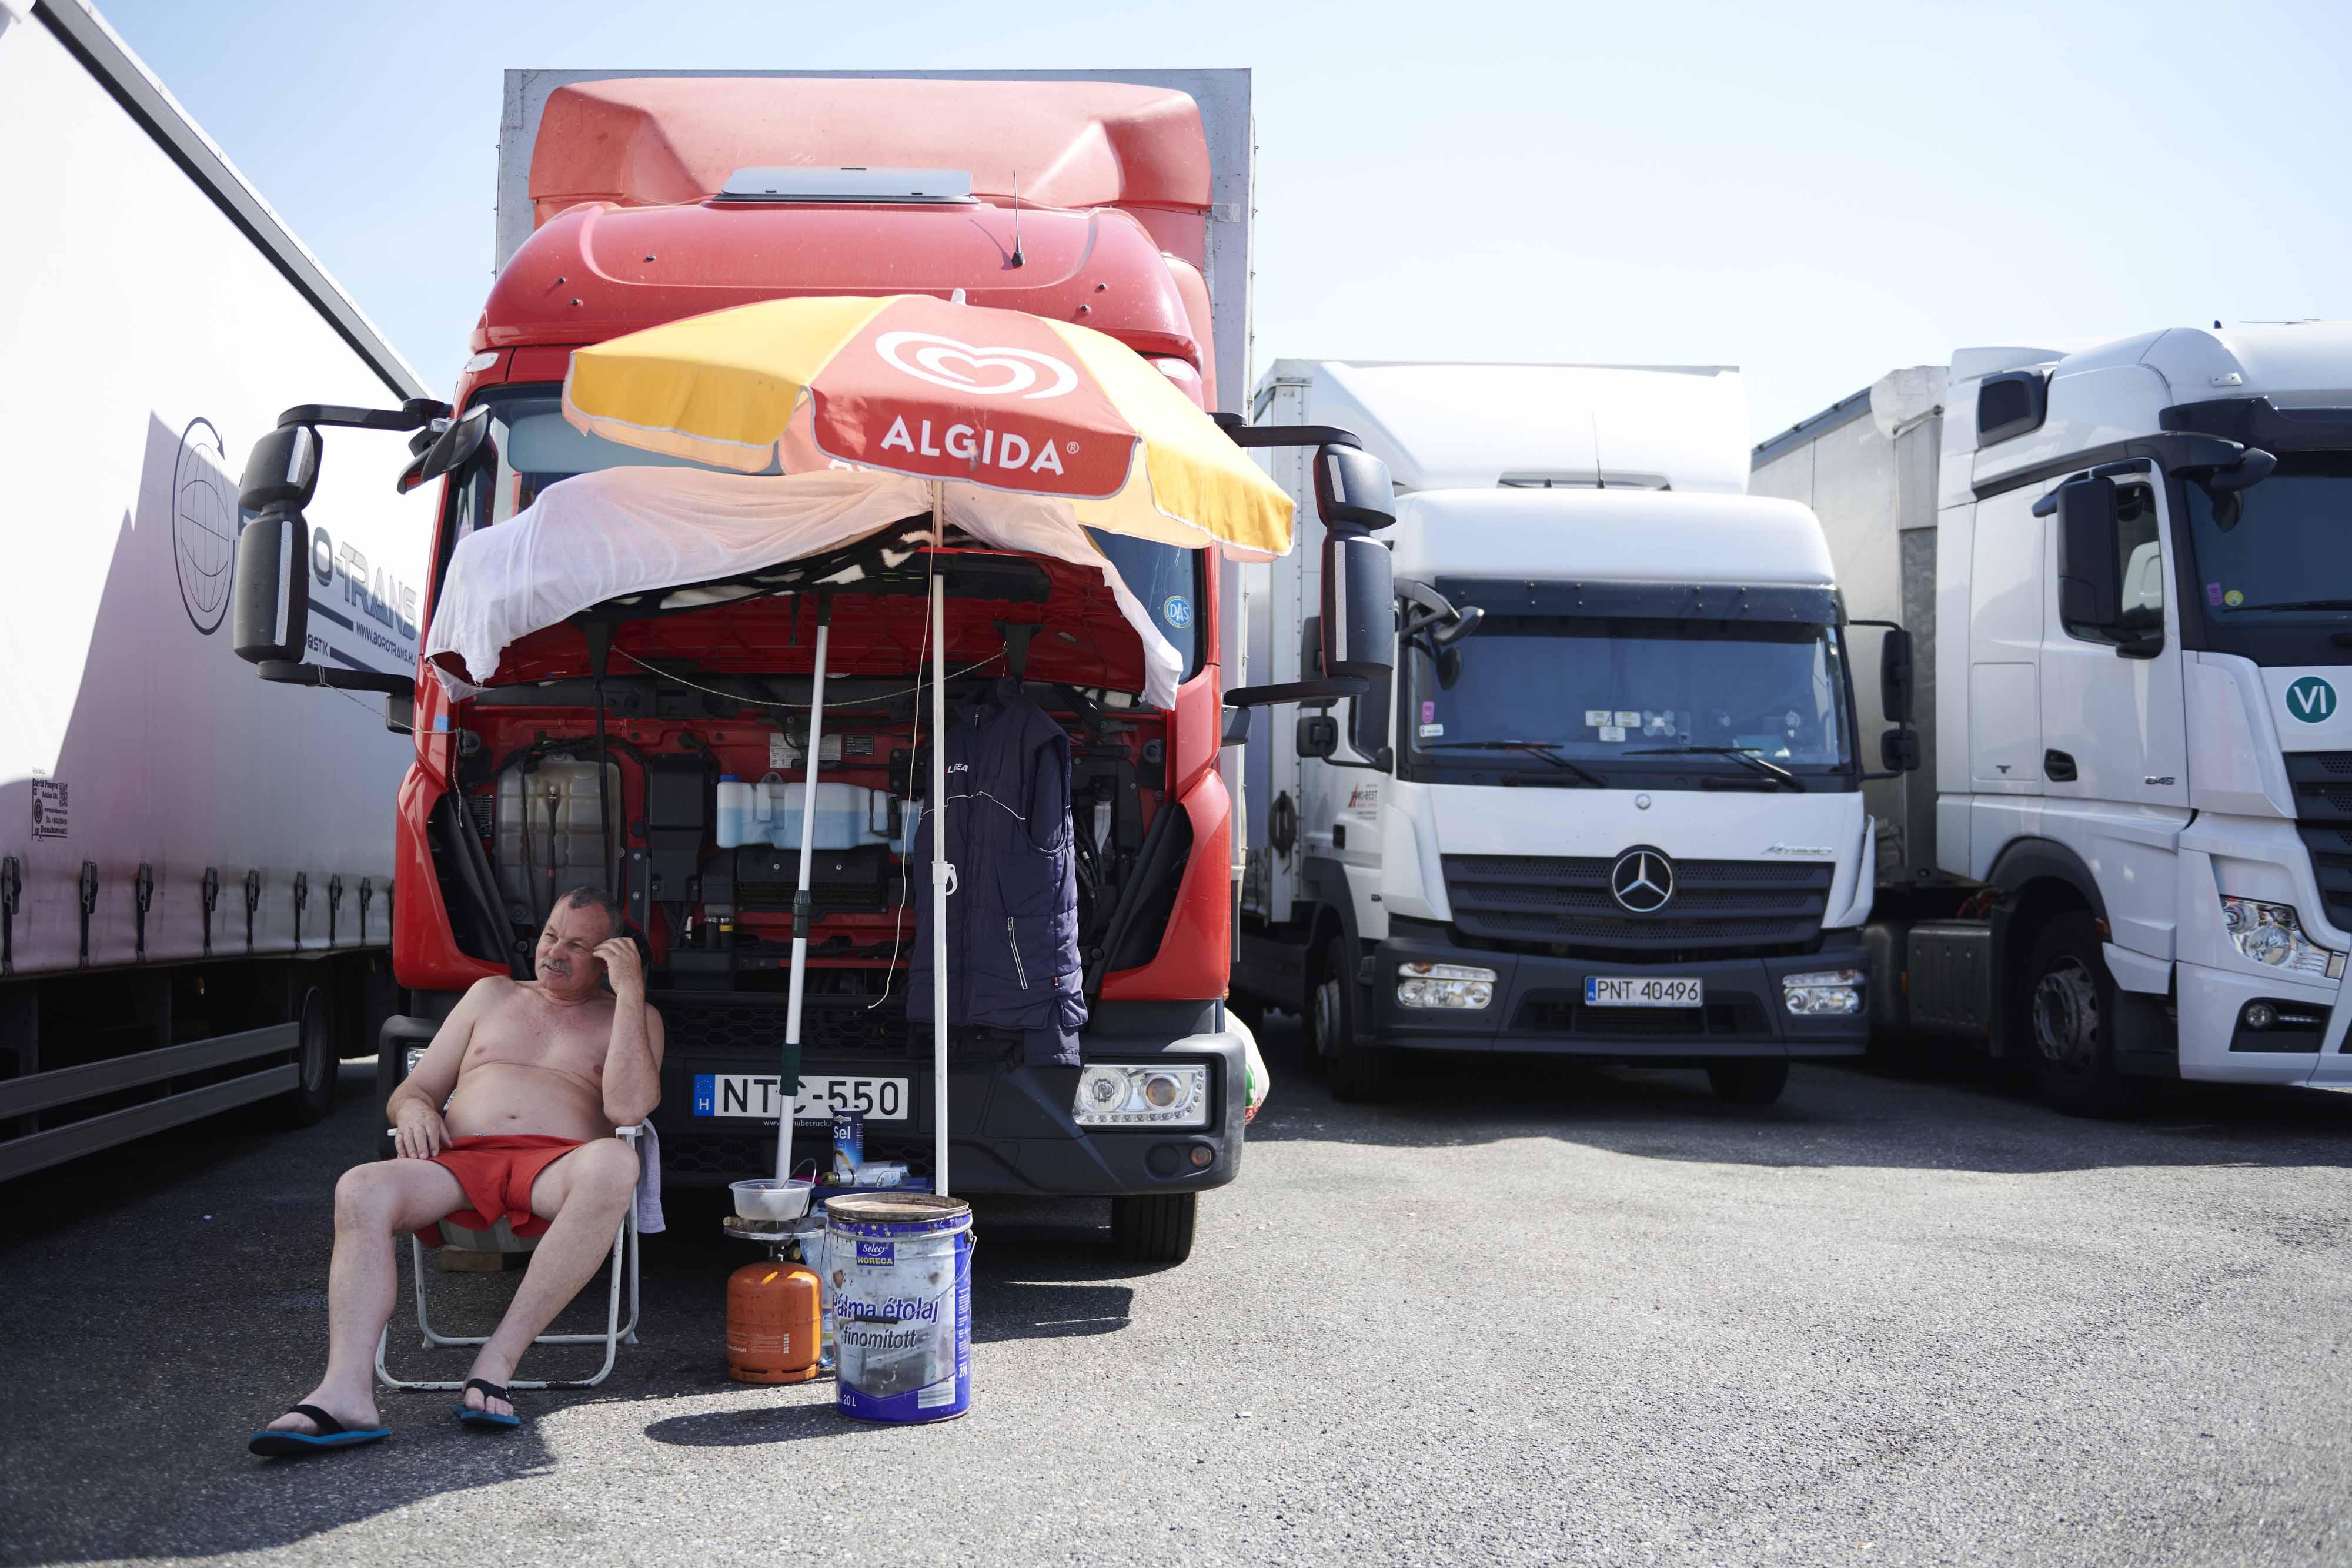 L'hi-tech per battere il dumping. La proposta dell'UE